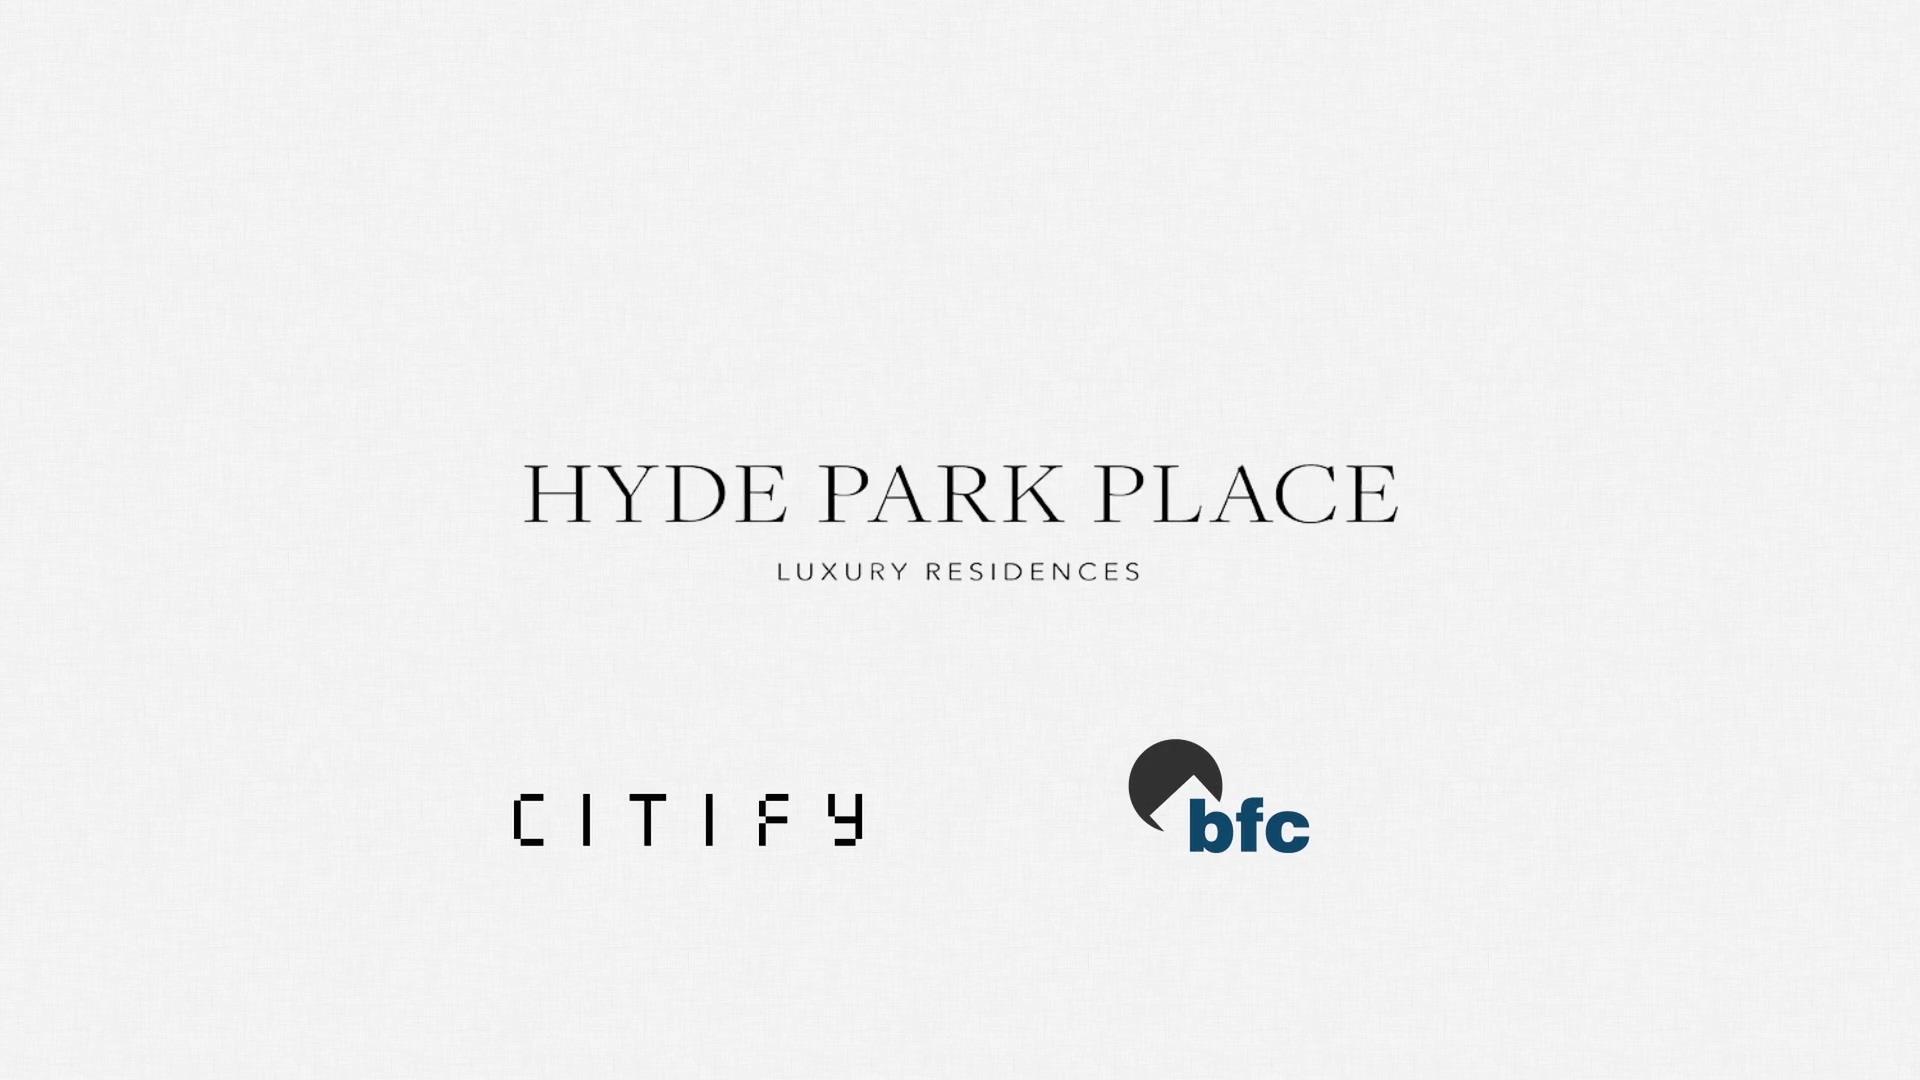 Citify - Hyde Park - July 2020